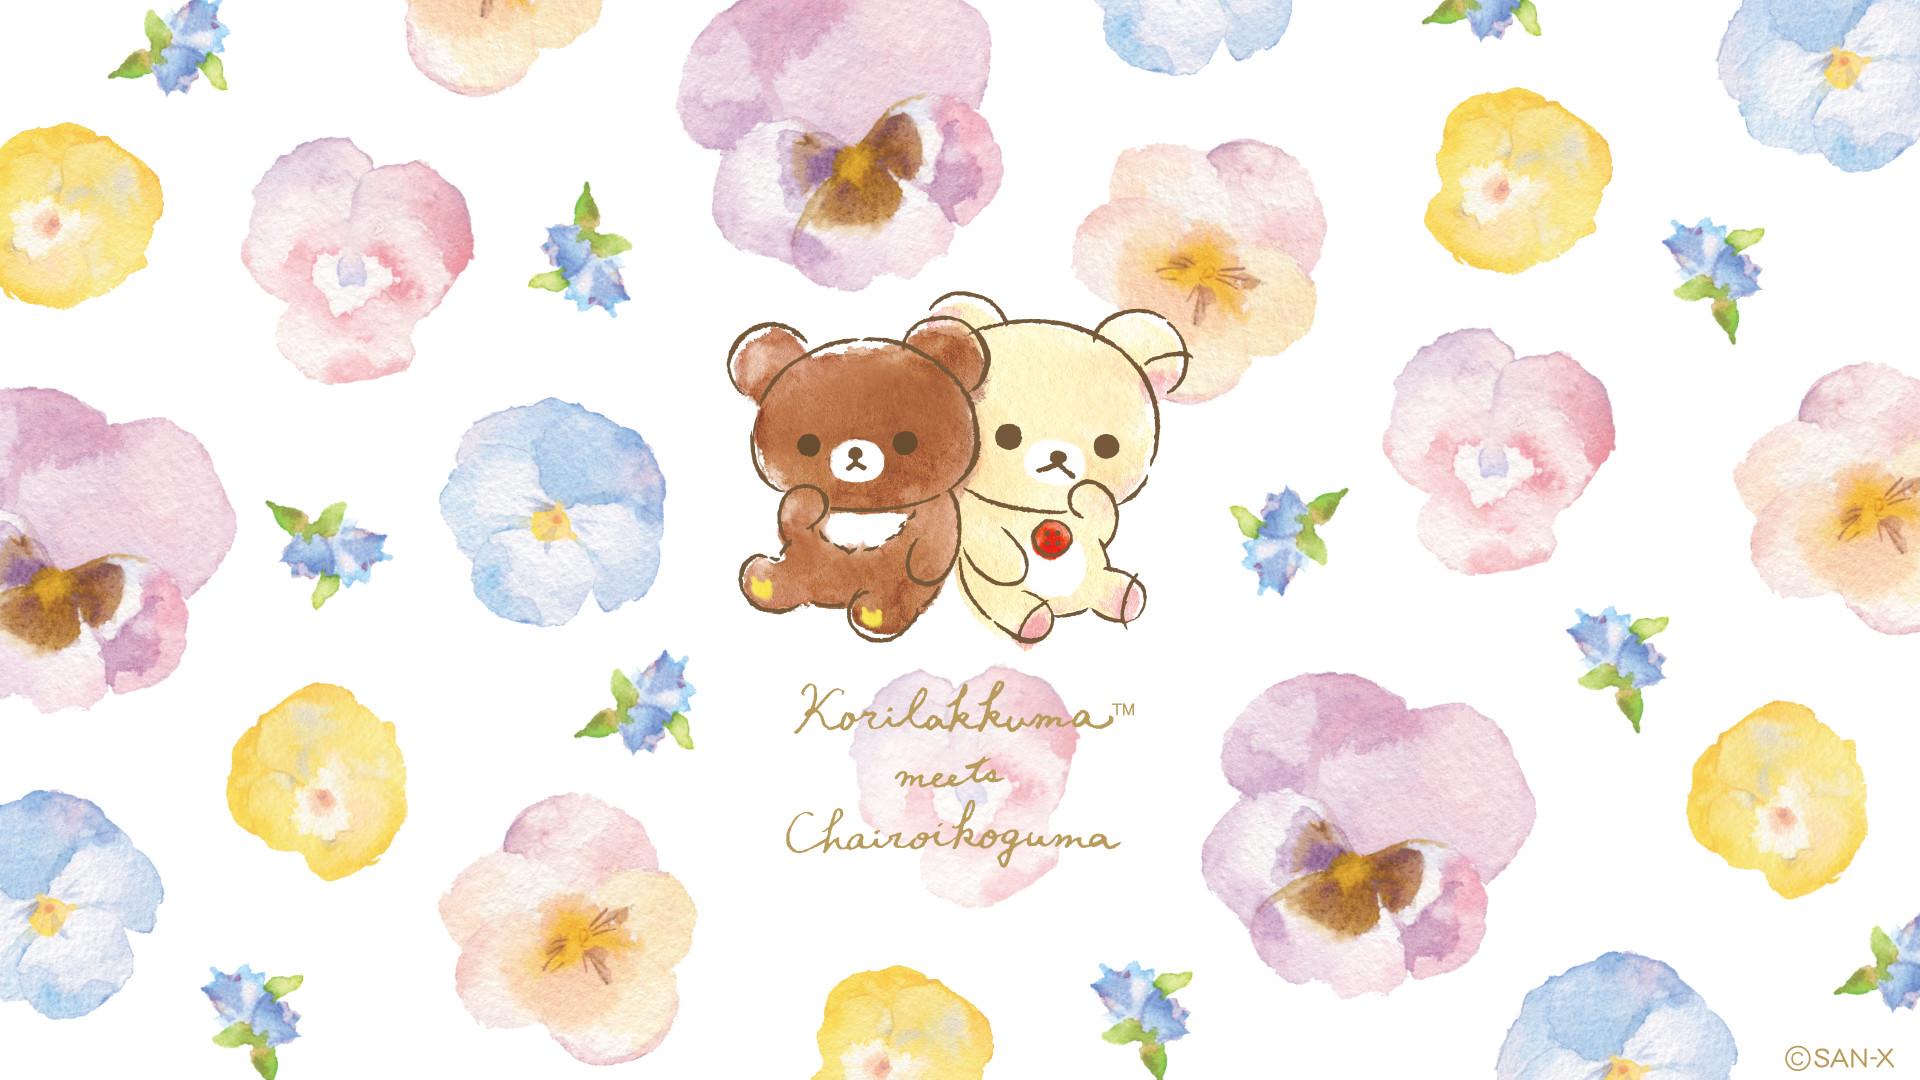 99_1080_1920.png (1920×1080)   Rilakkuma*Japan*Character   Pinterest    Rilakkuma, Kawaii and Hello kitty